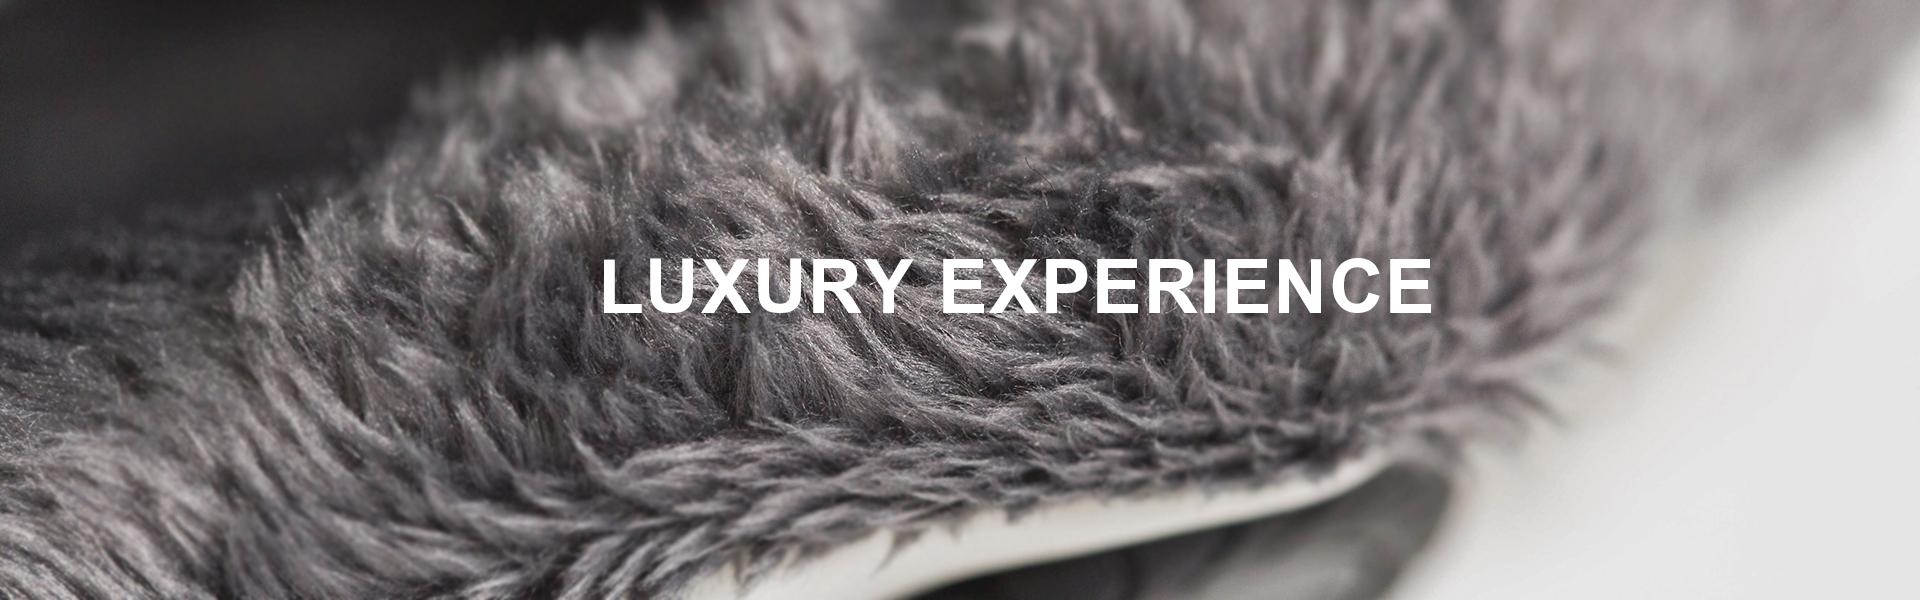 LUXURY EXPERIENCE 奢華體驗 奢華滑雪